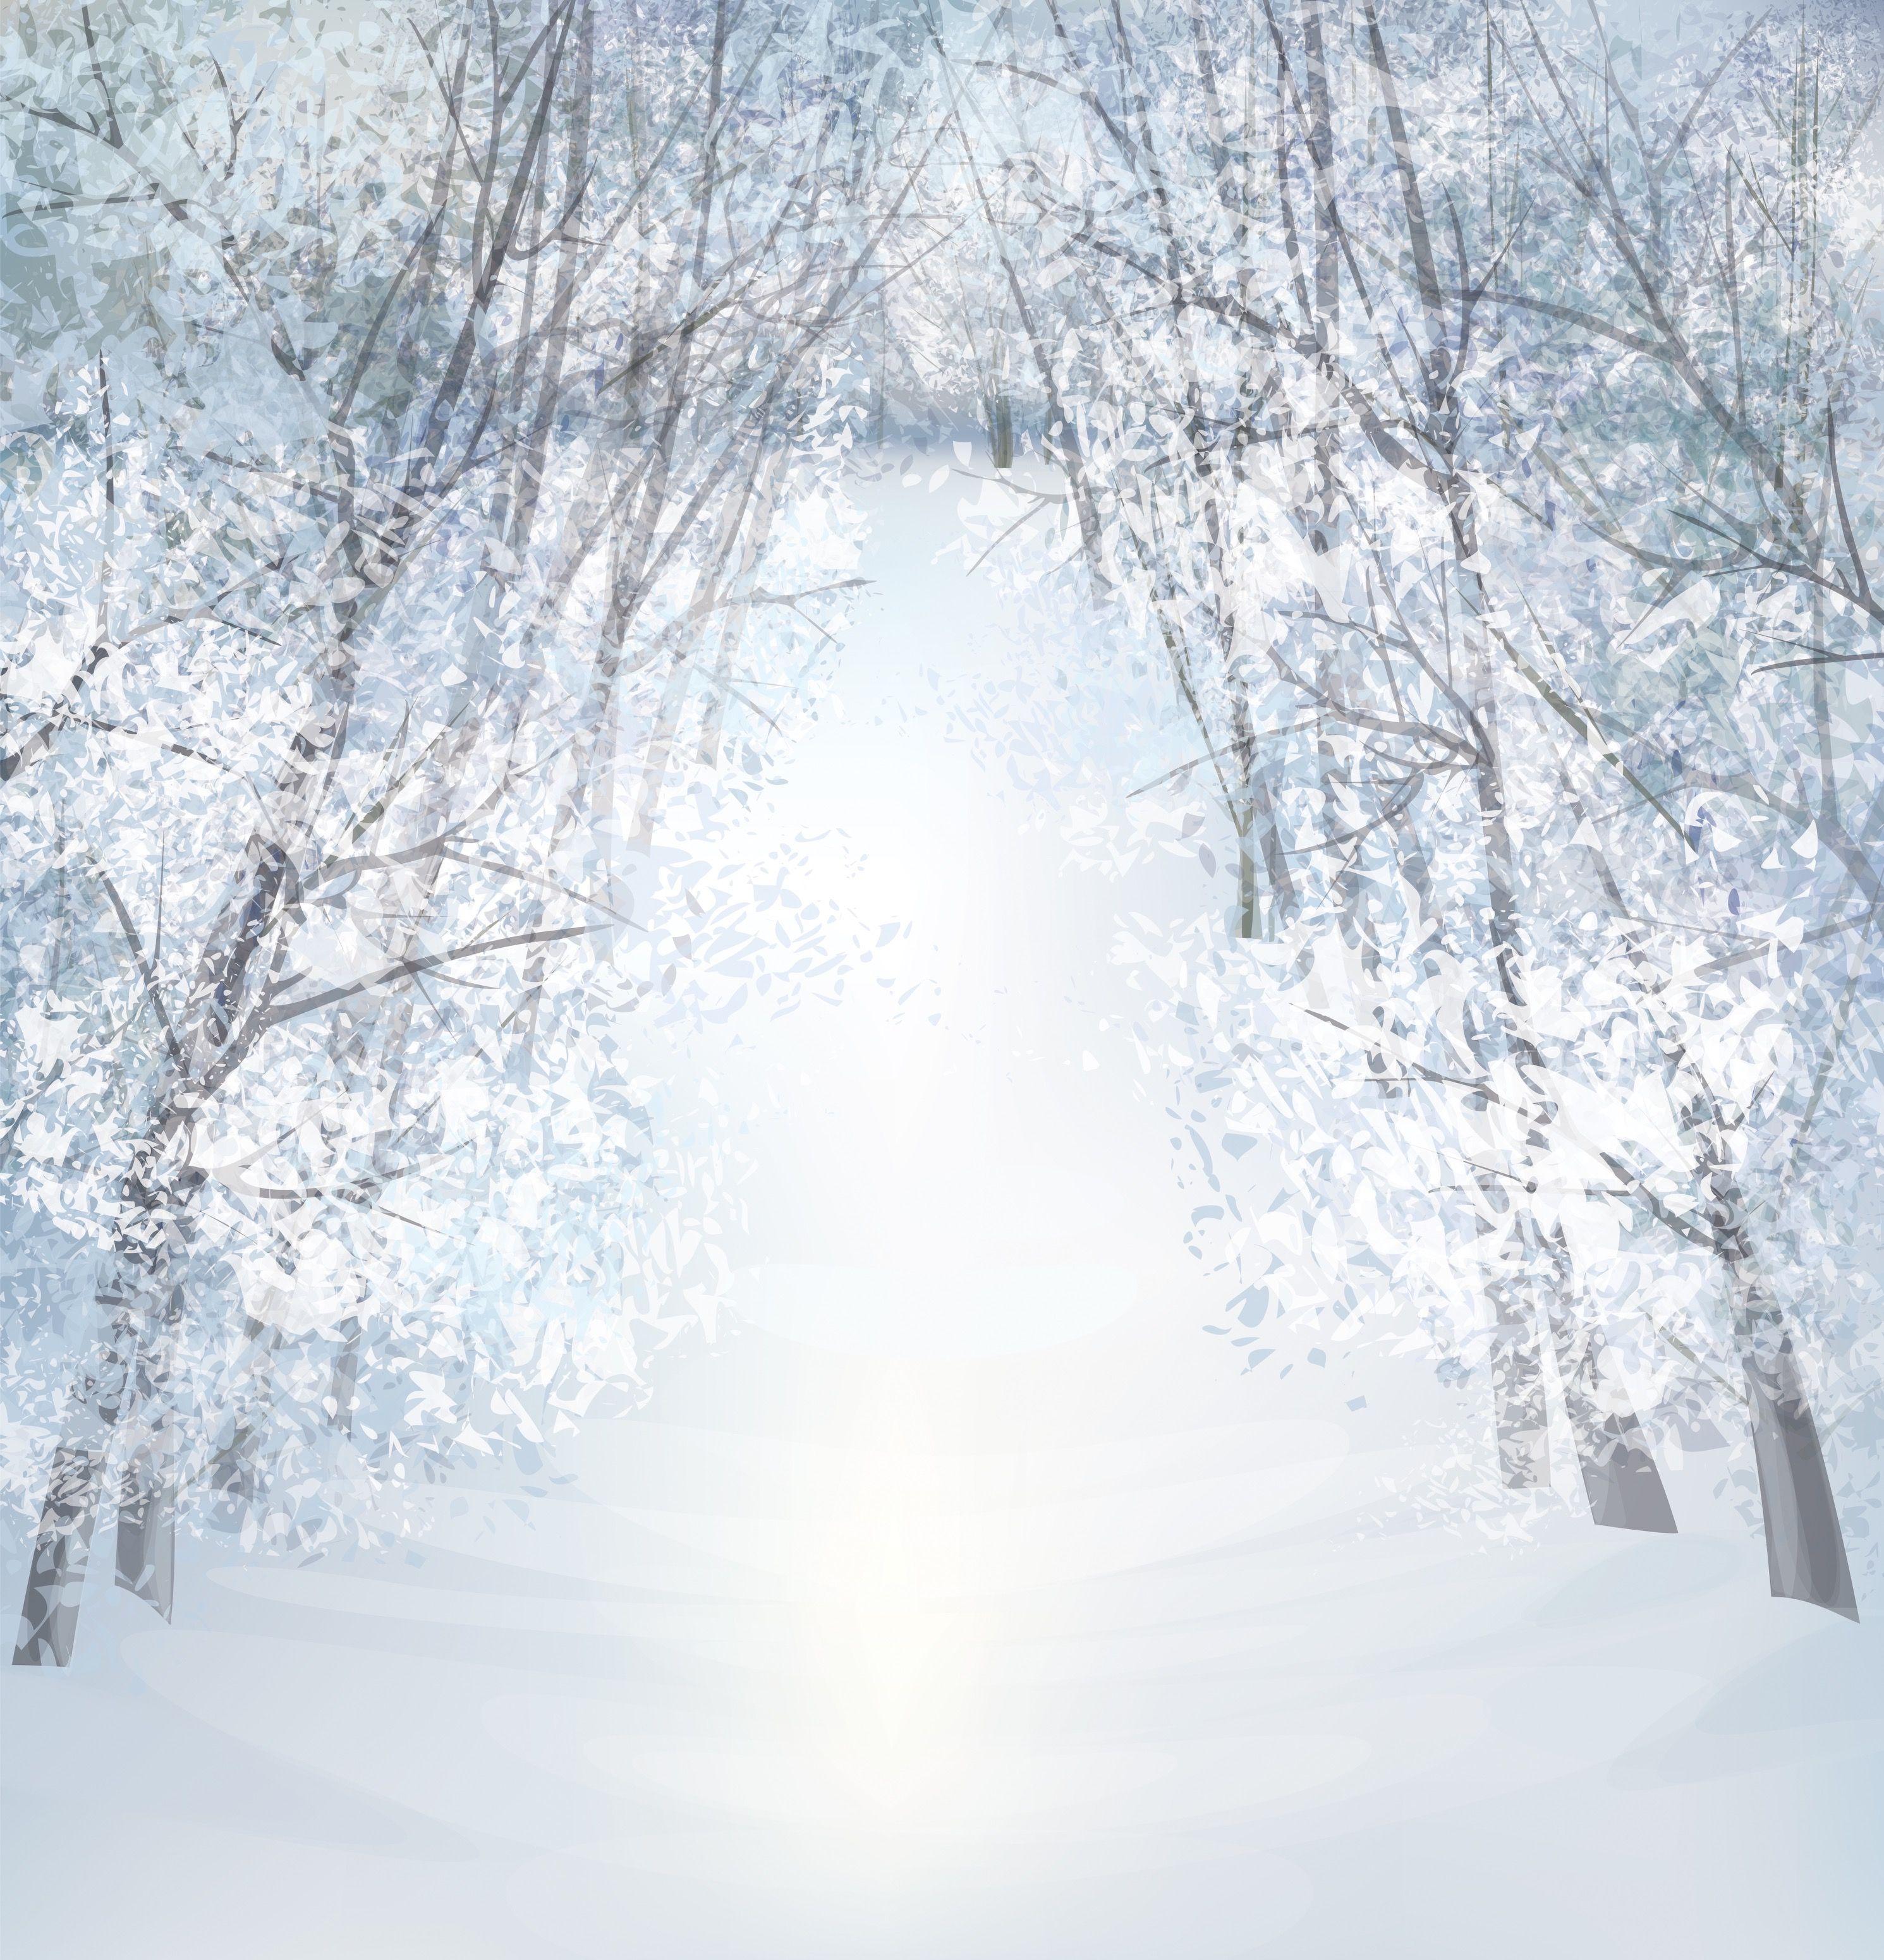 10x10 Winter Trees Christmas Photography Backdrops Christmas Backdrops Background For Photography